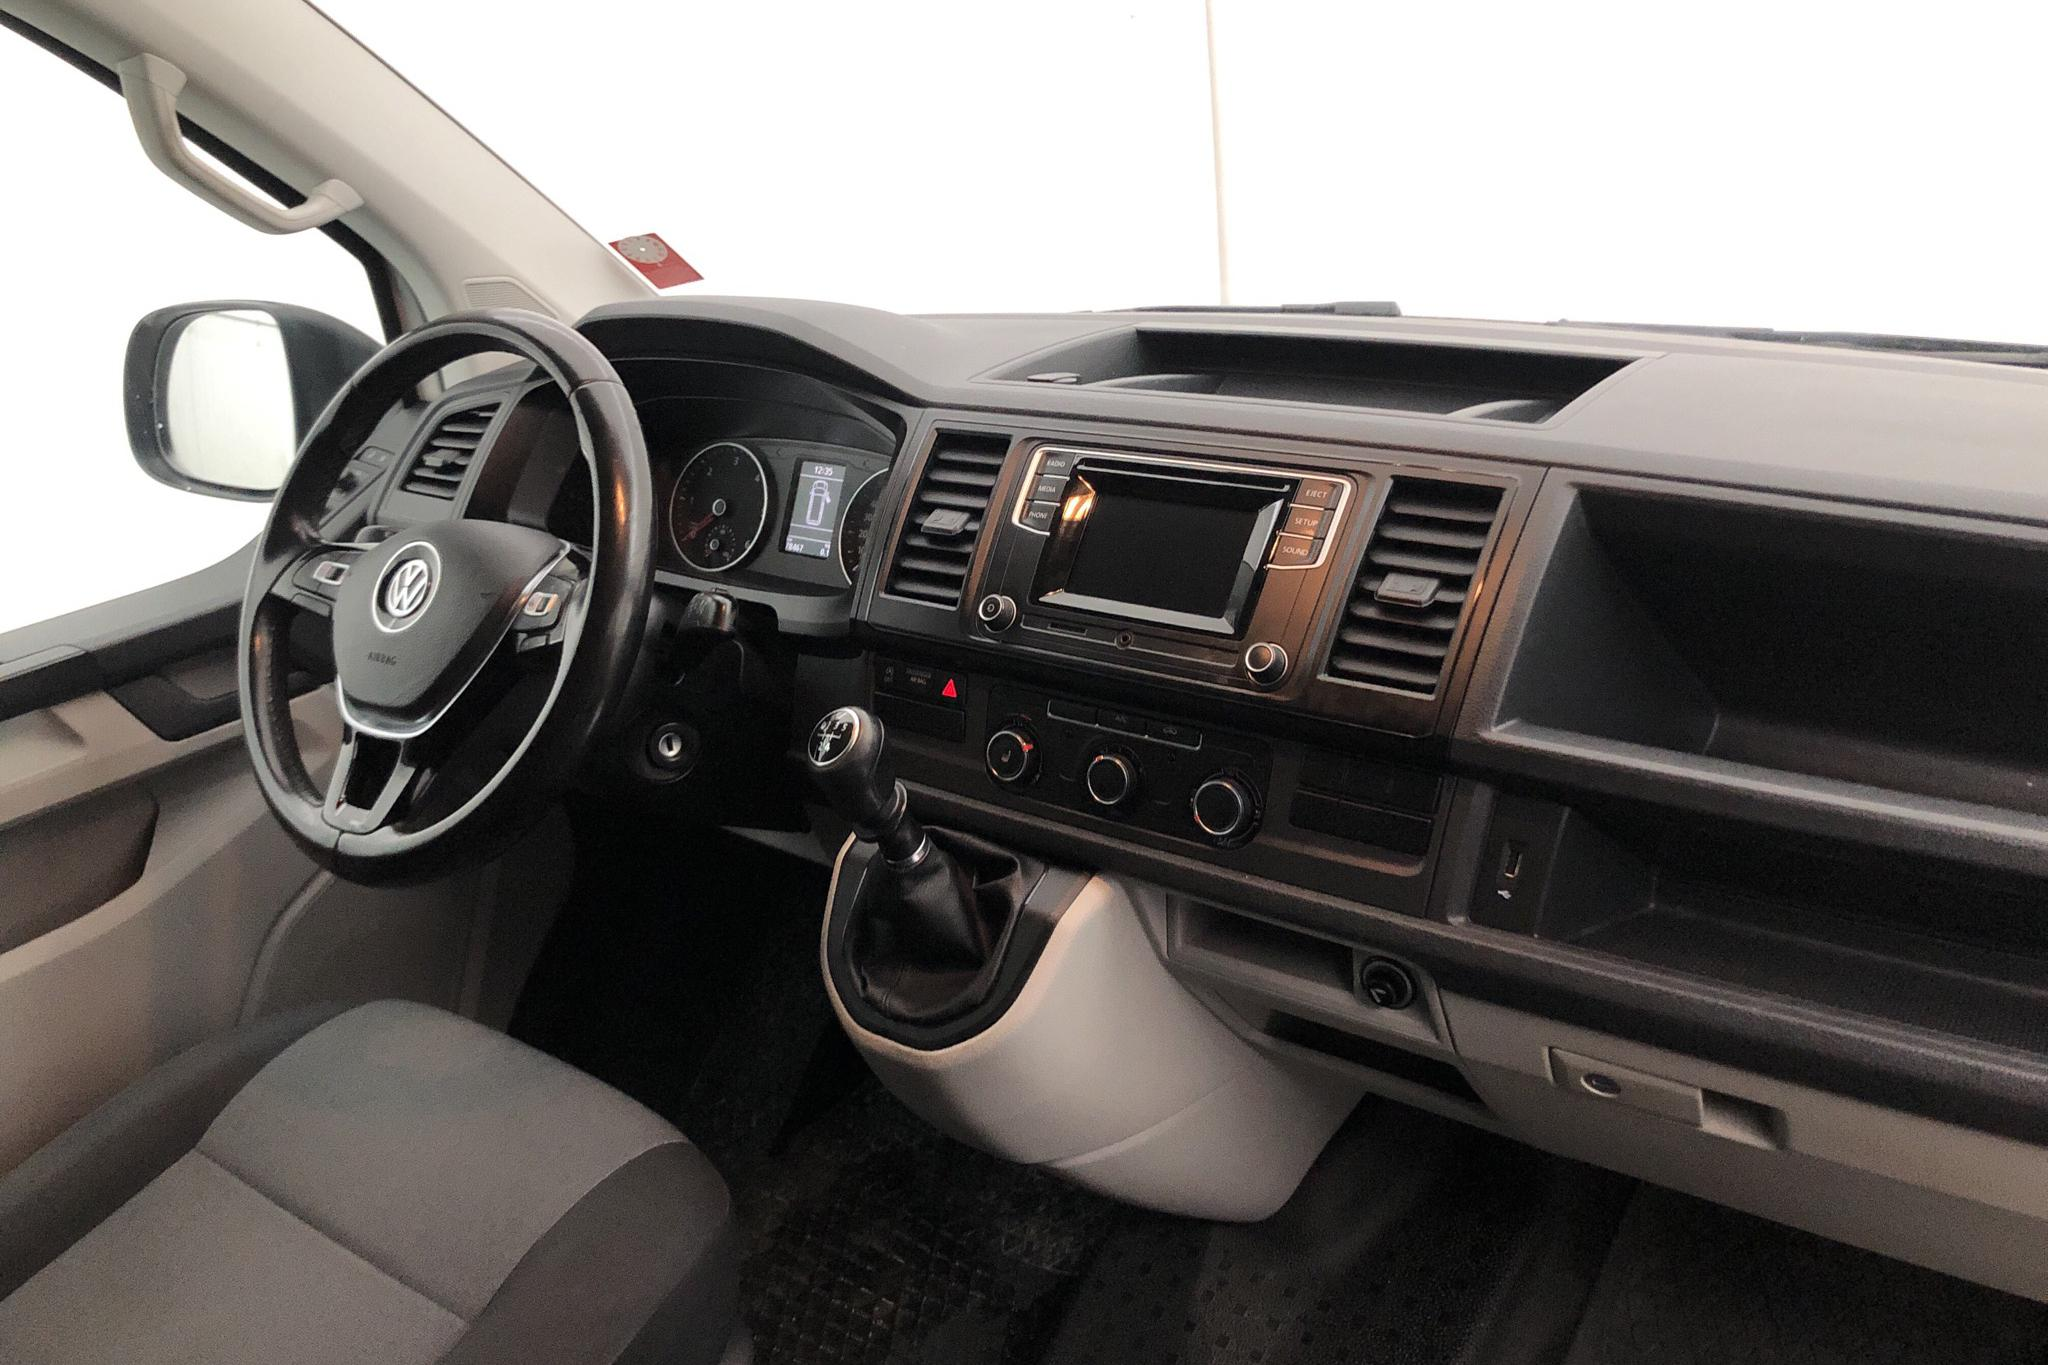 VW Transporter T6 2.0 TDI BMT Skåp (102hk) - 78 460 km - Manual - white - 2018